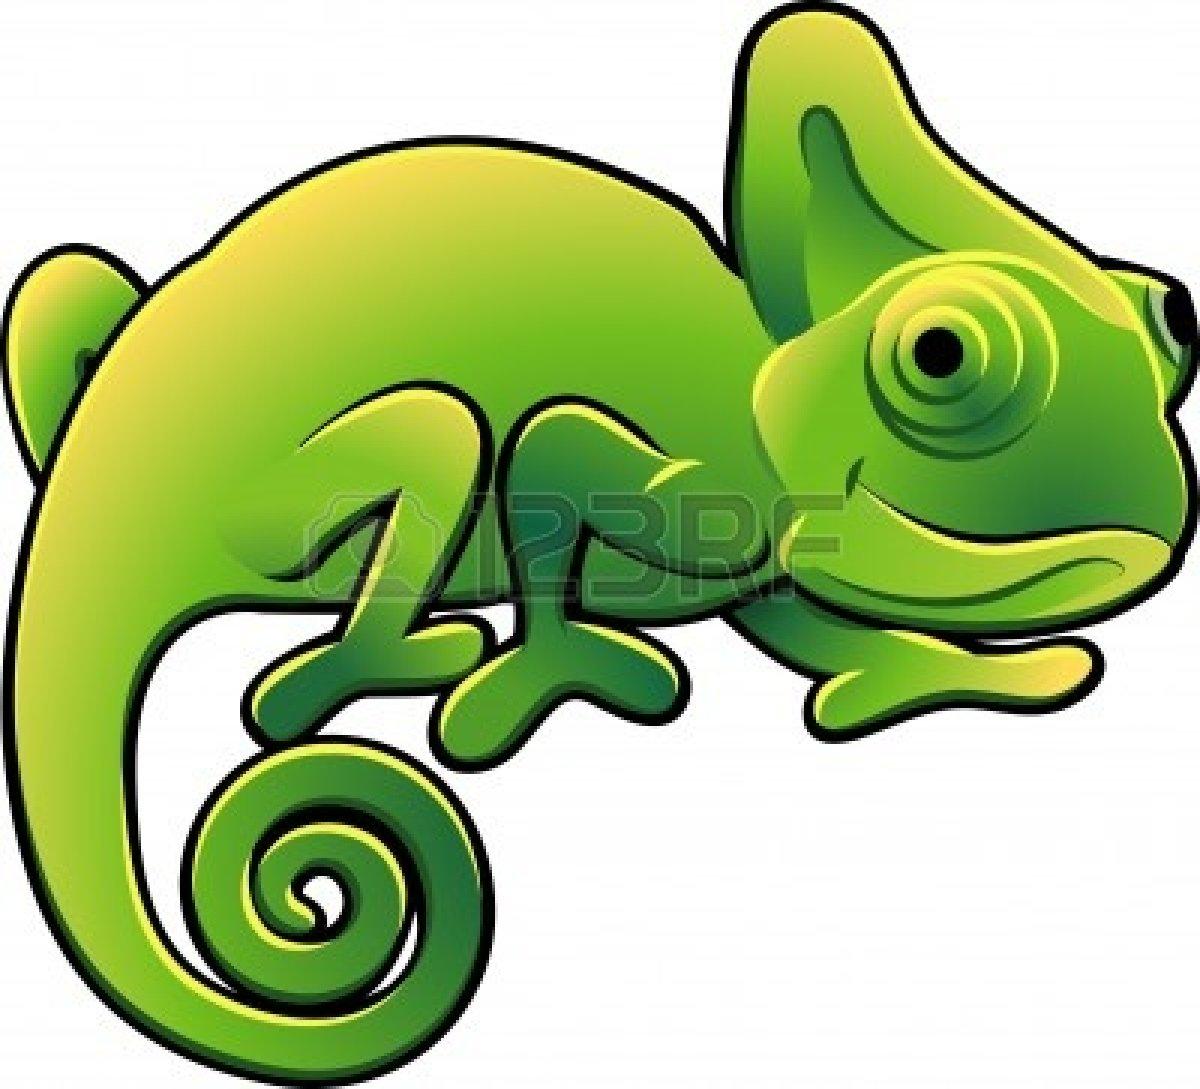 Cute iguana clipart black and white download Iguana cute lizard clipart free images - WikiClipArt black and white download